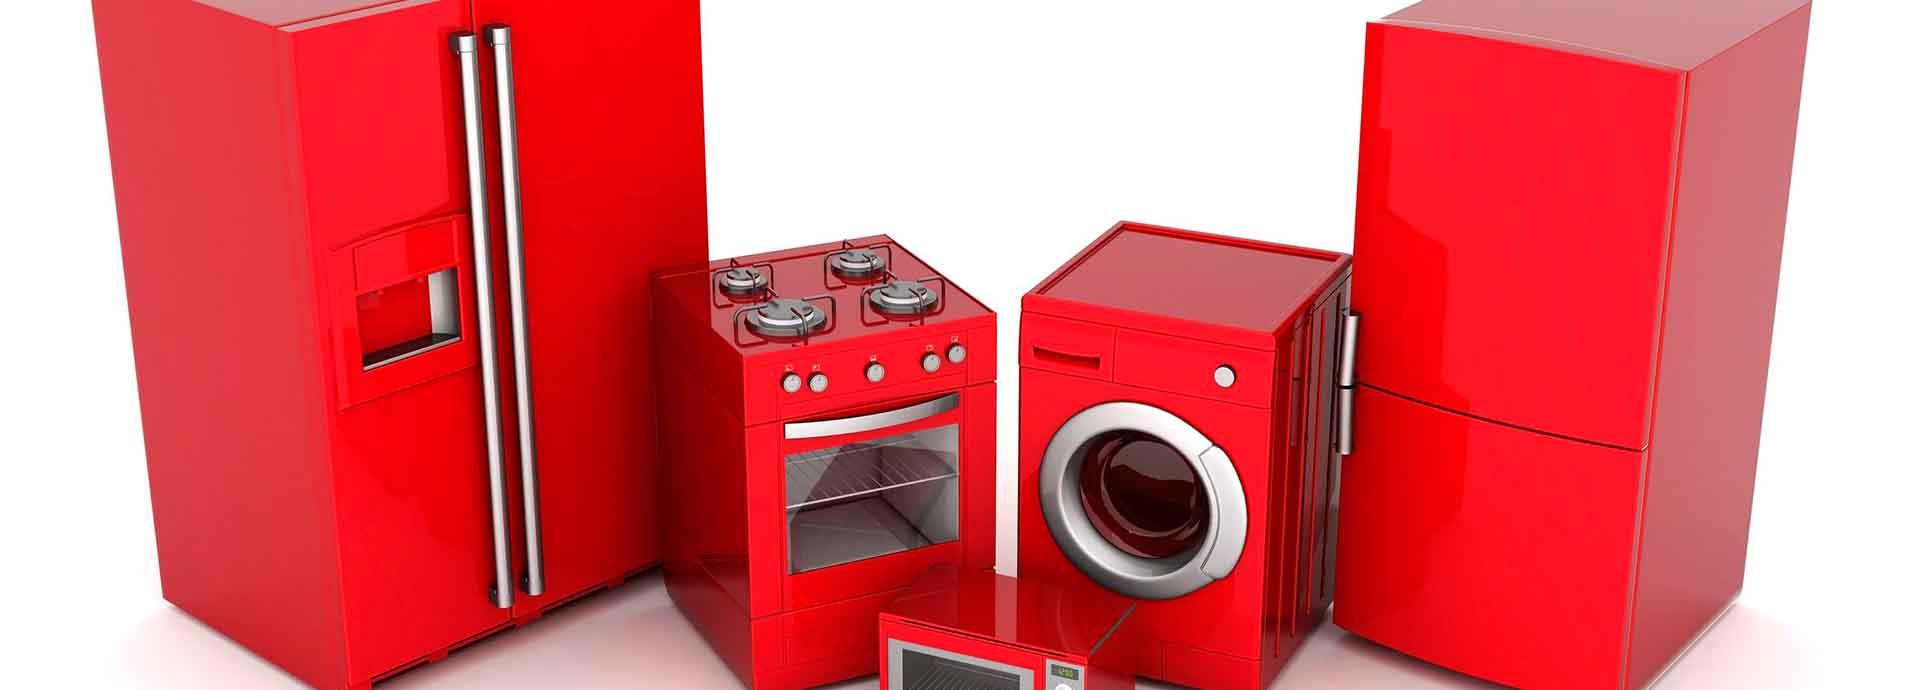 electrodomesticos_baratos_ofertas